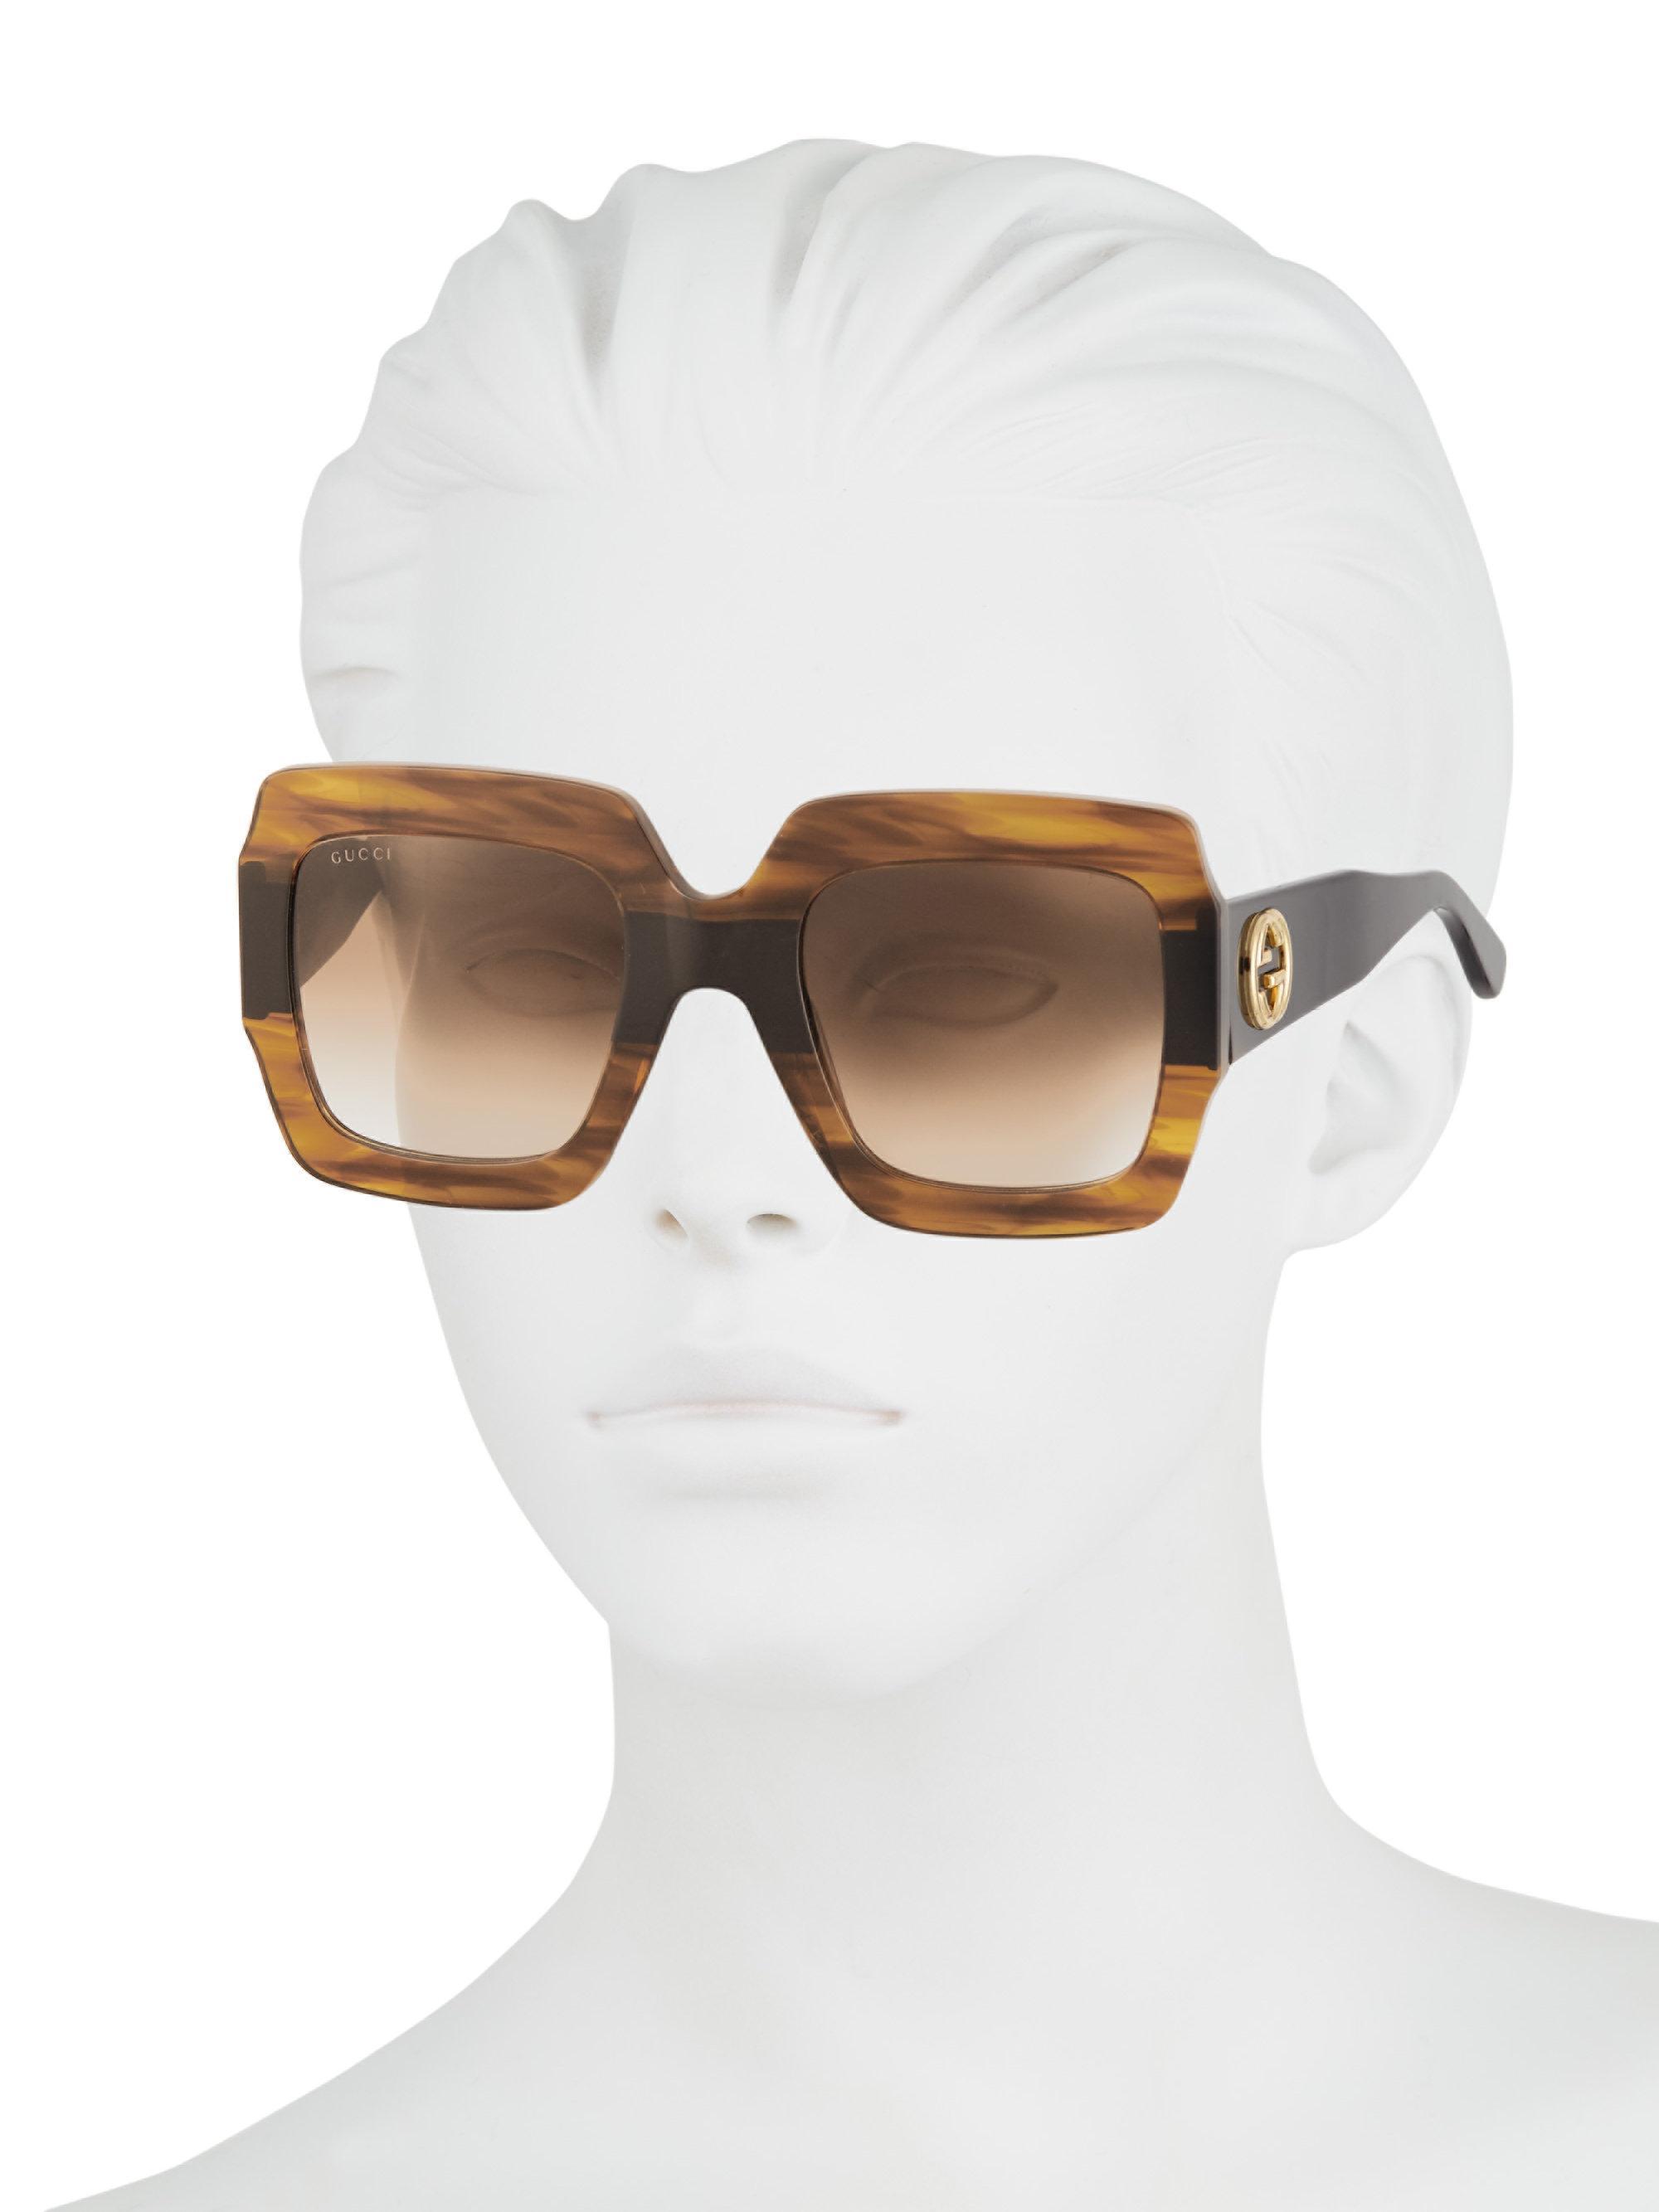 6423b7bcf Gucci - Multicolor 54mm Square Sunglasses - Shny Multlay Gloss Rose/brn -  Lyst. View fullscreen